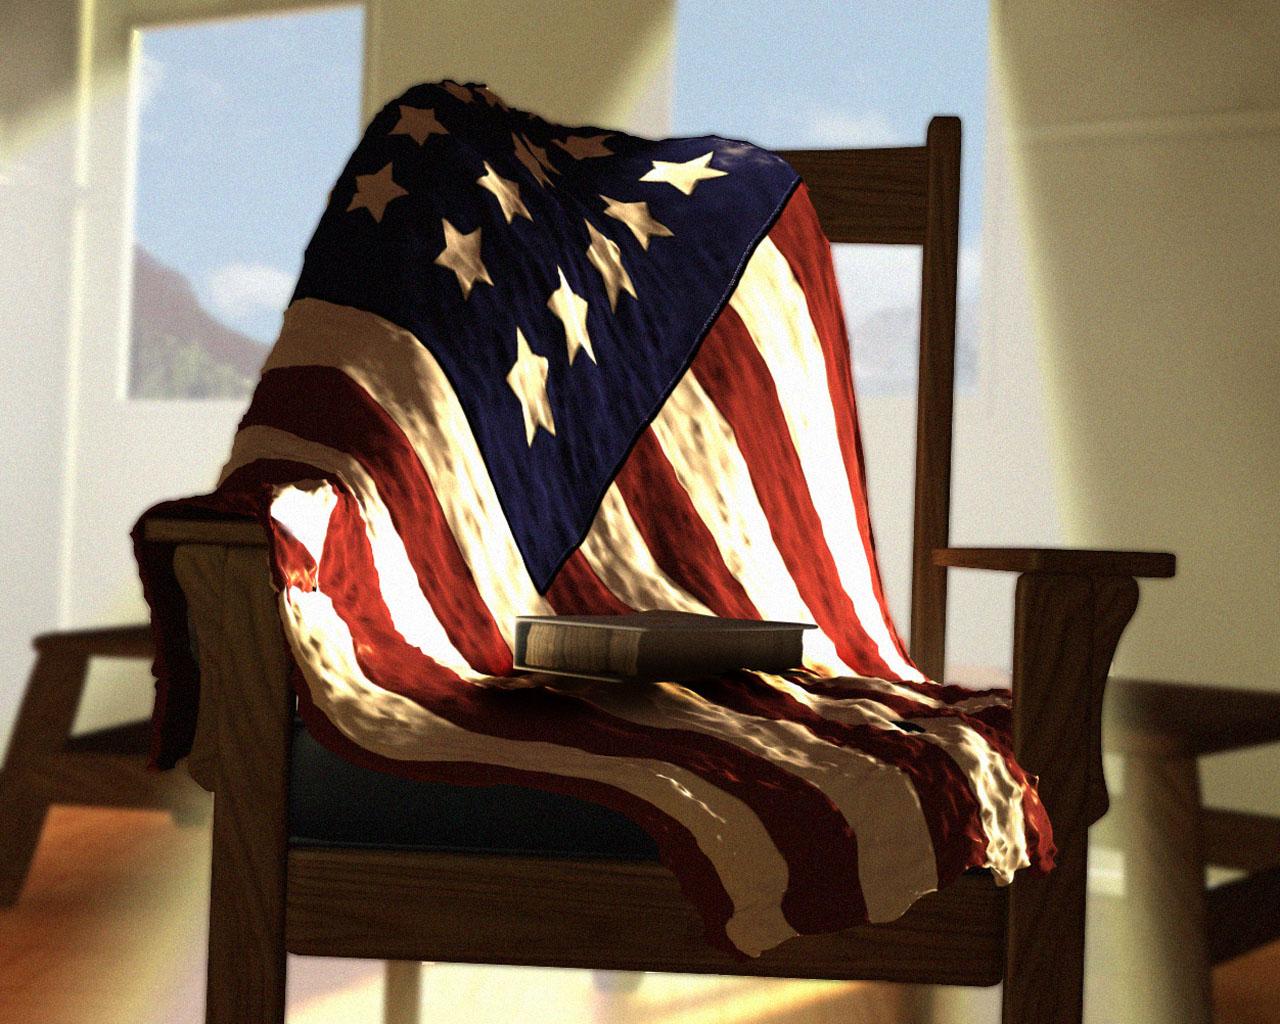 The American flag 3d pictures screensavers desktop download 1280x1024